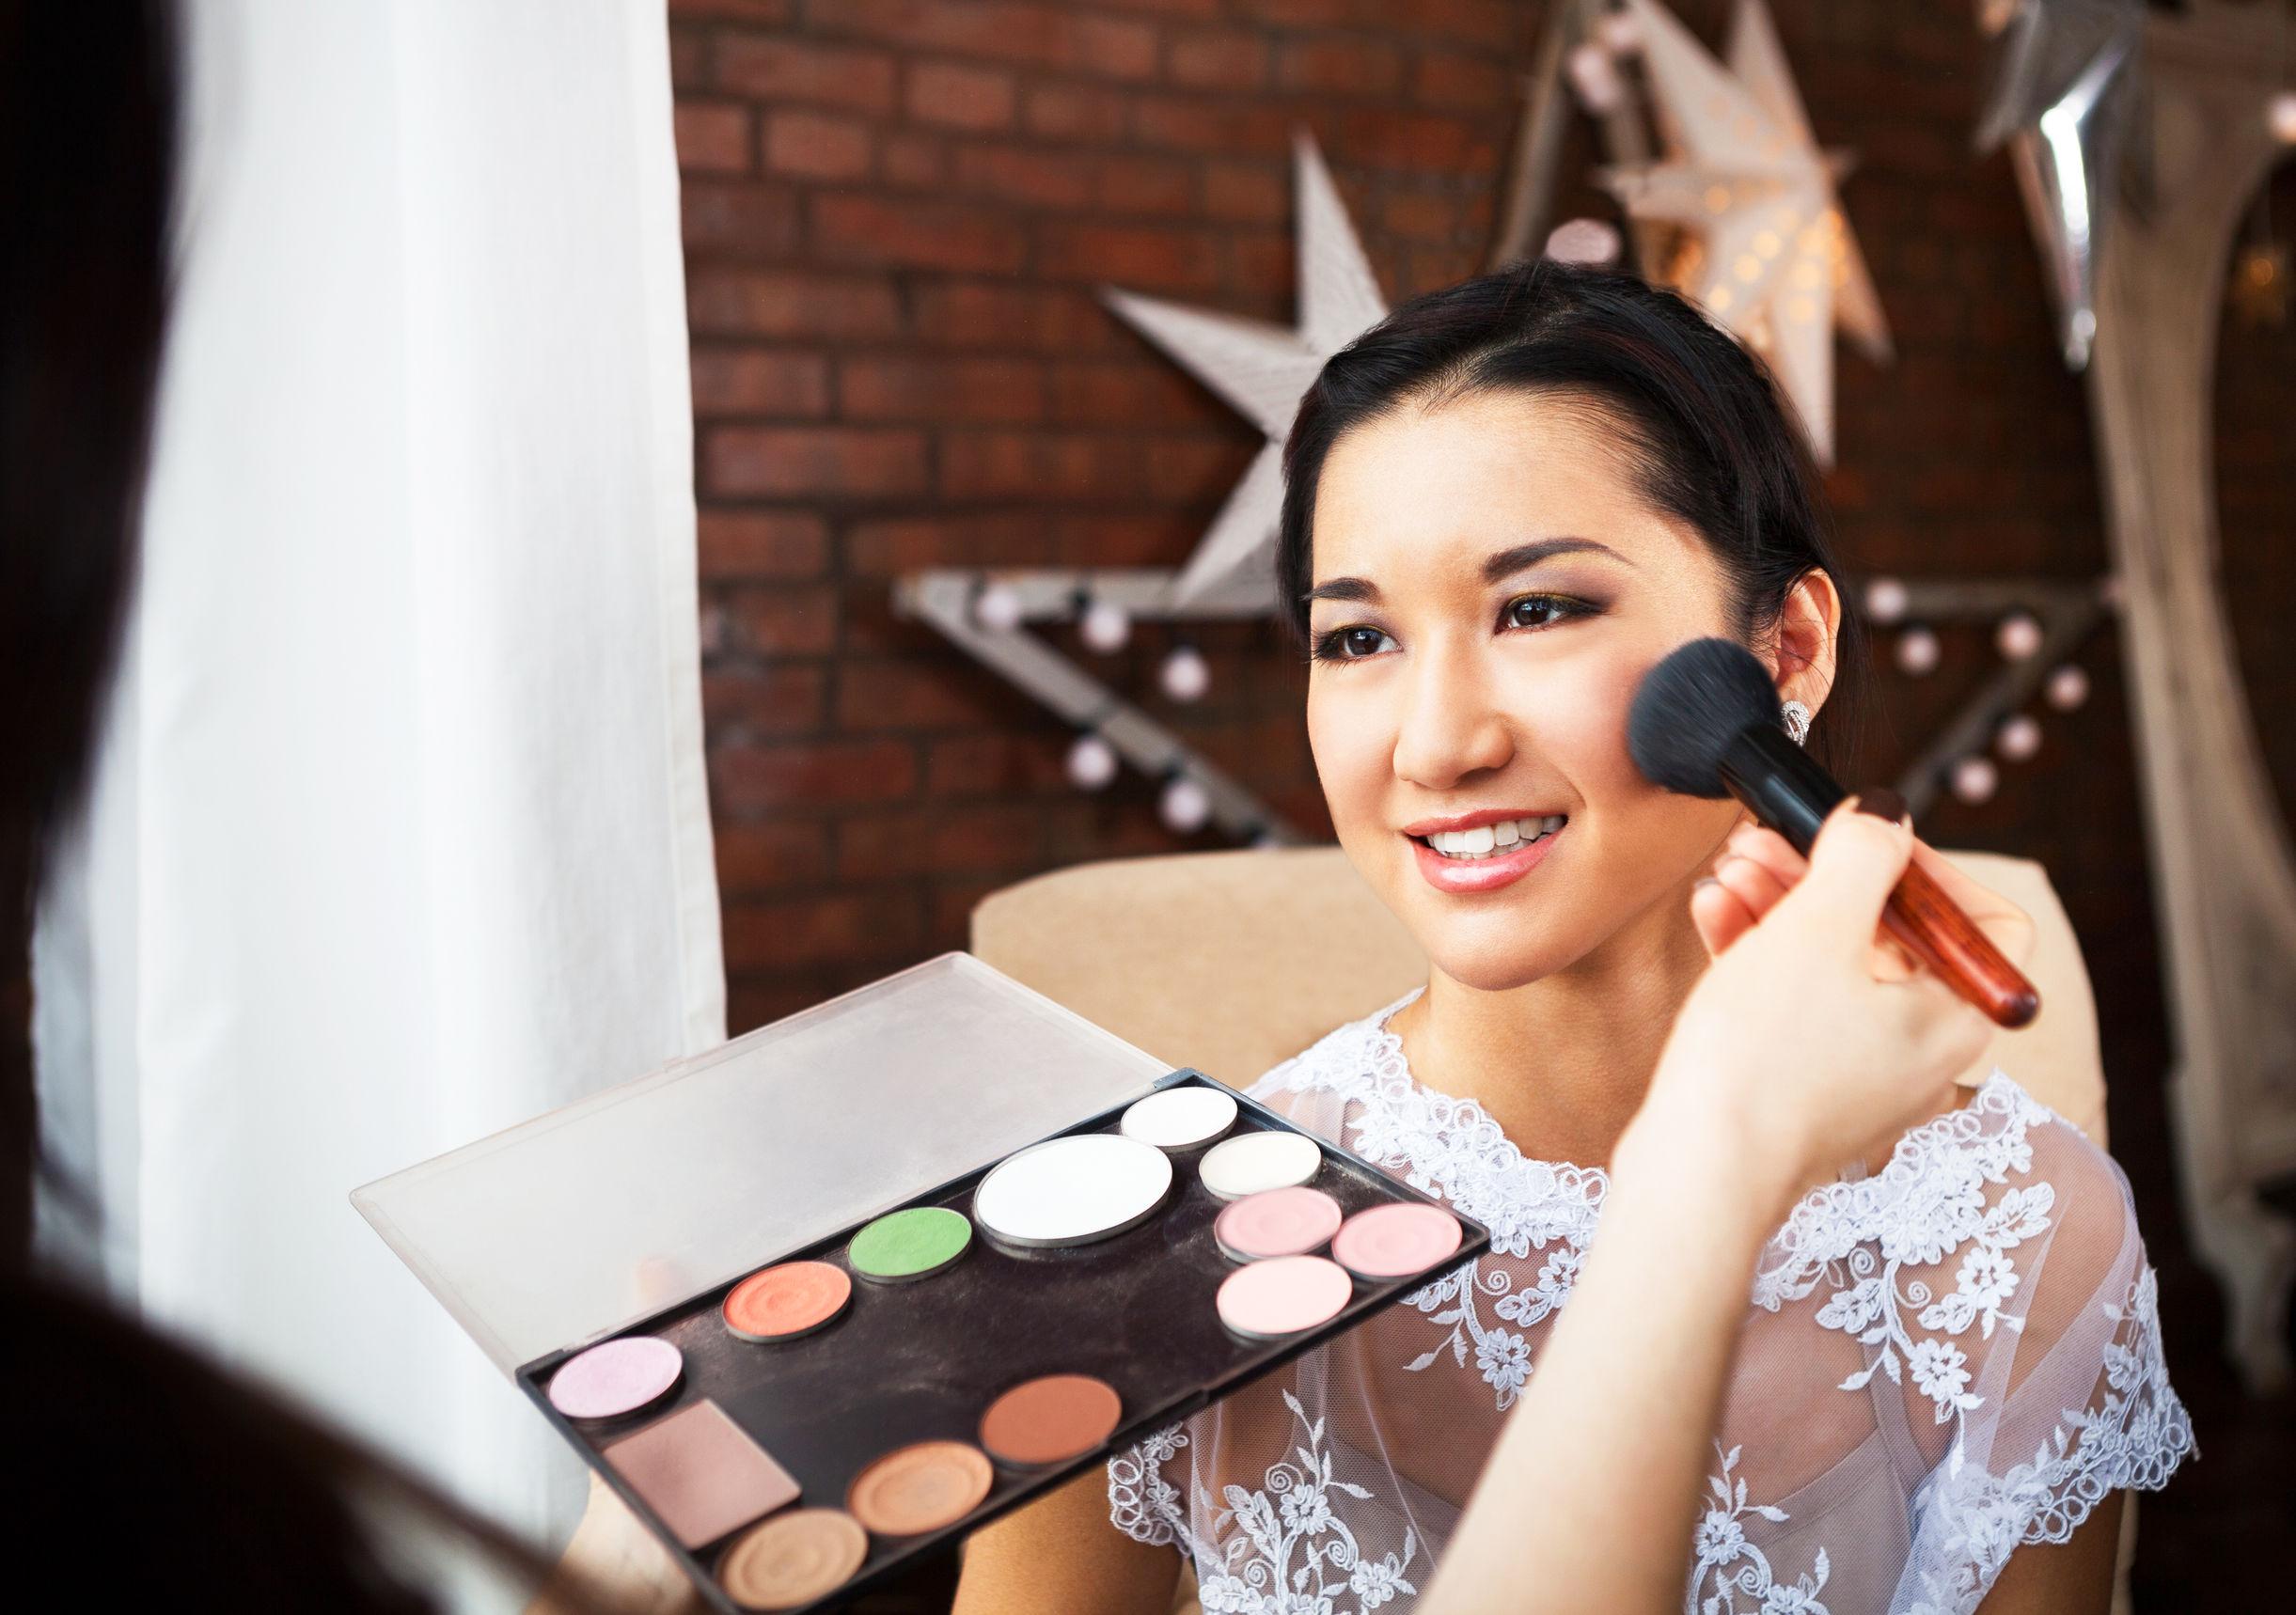 Imagen de una joven siendo maquillada